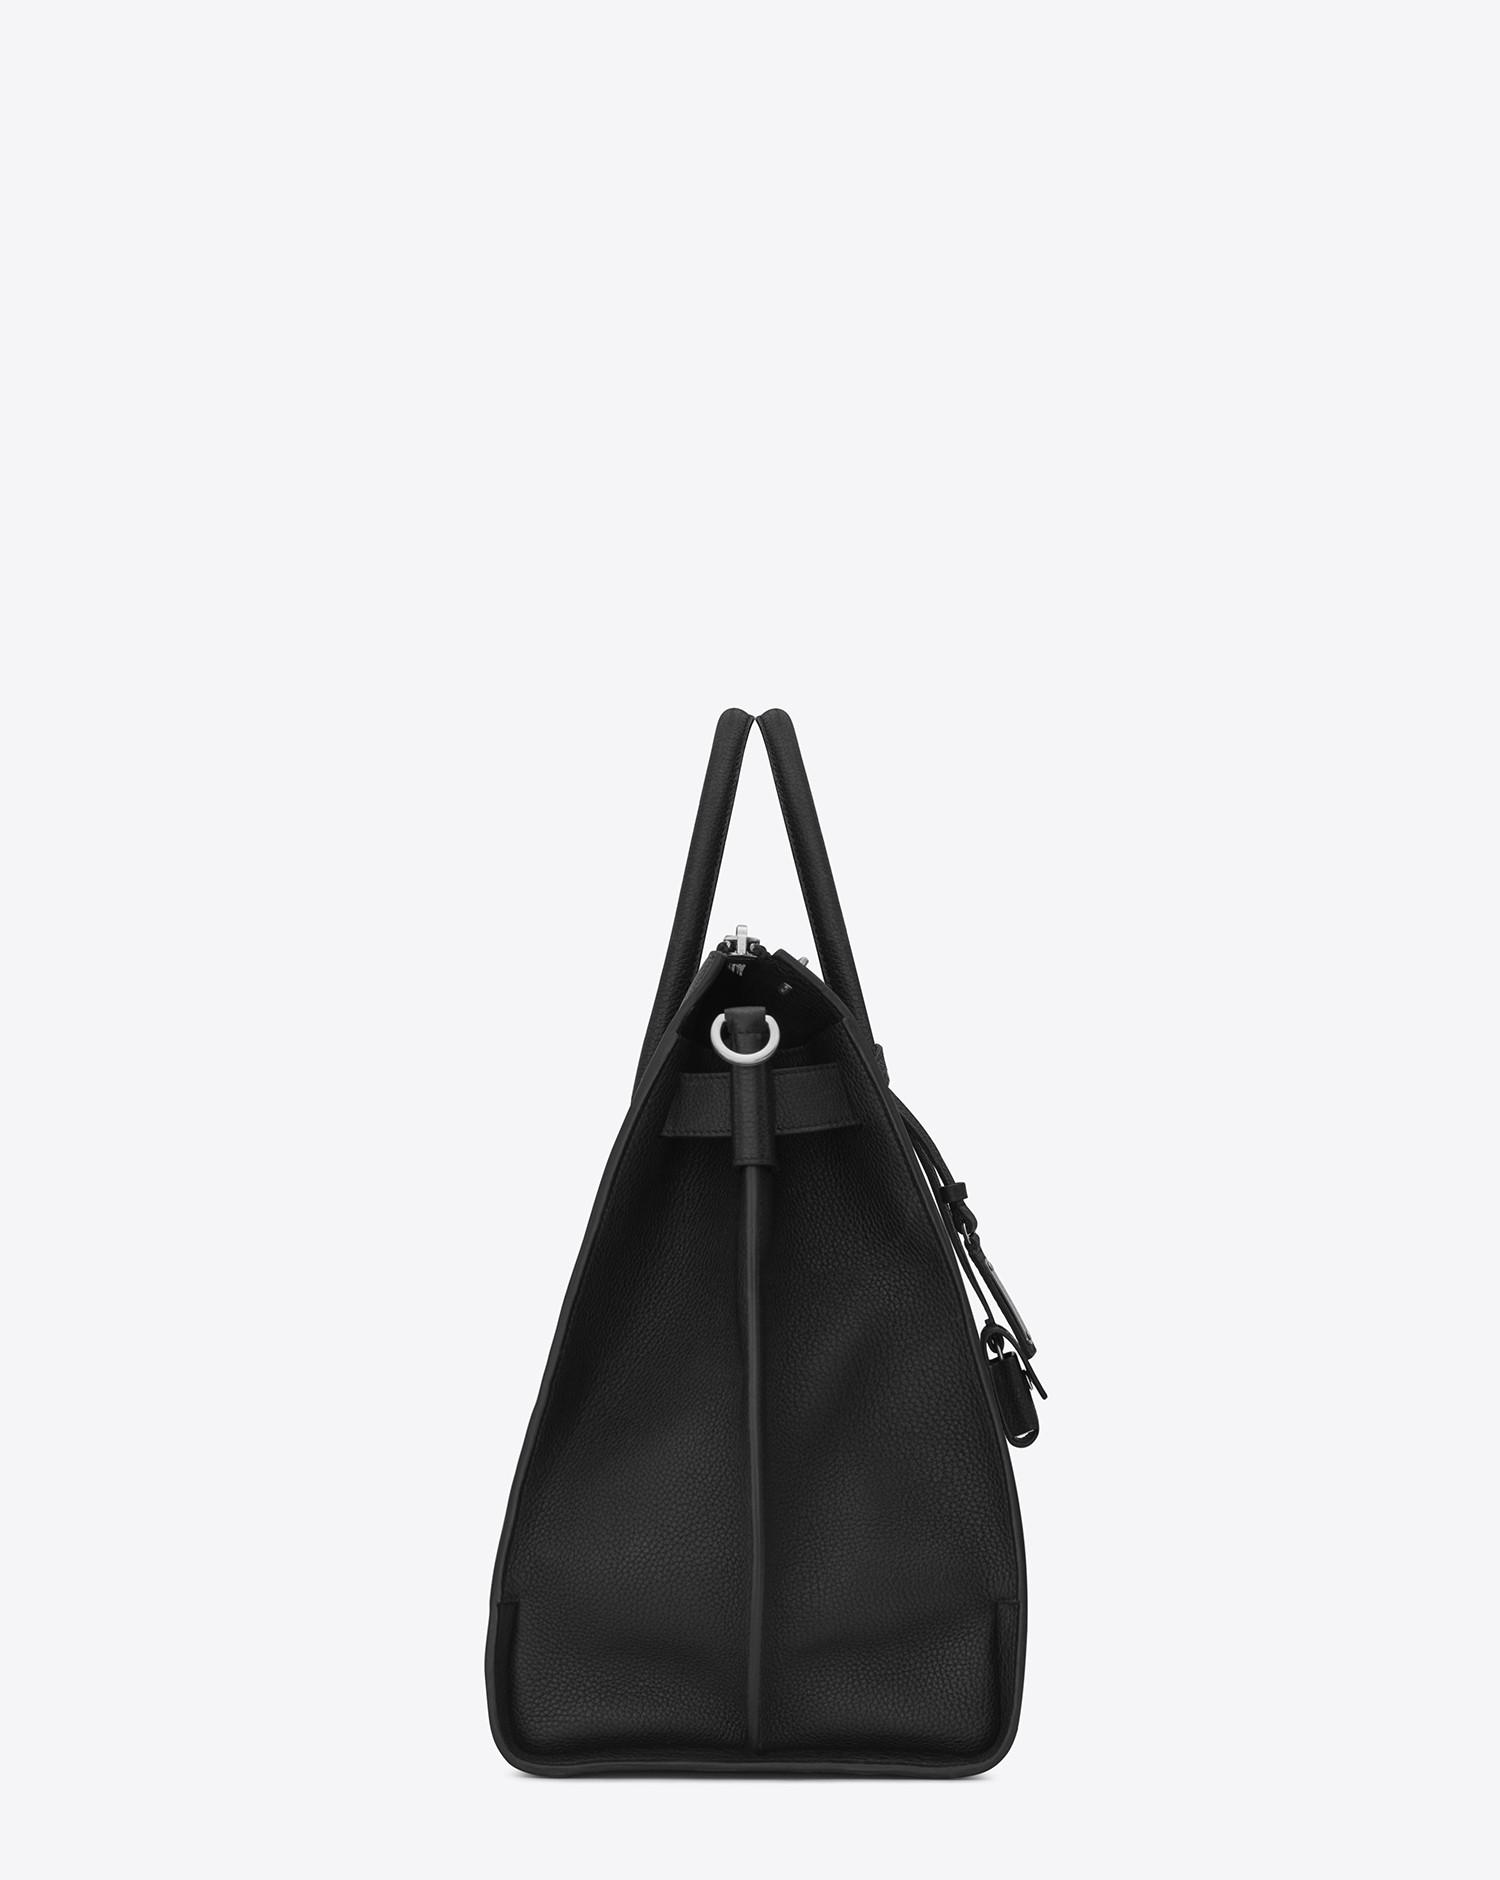 Lyst - Saint Laurent Sac De Jour 48h Duffle Bag In Grained Leather in Black  for Men 81dab987fa934